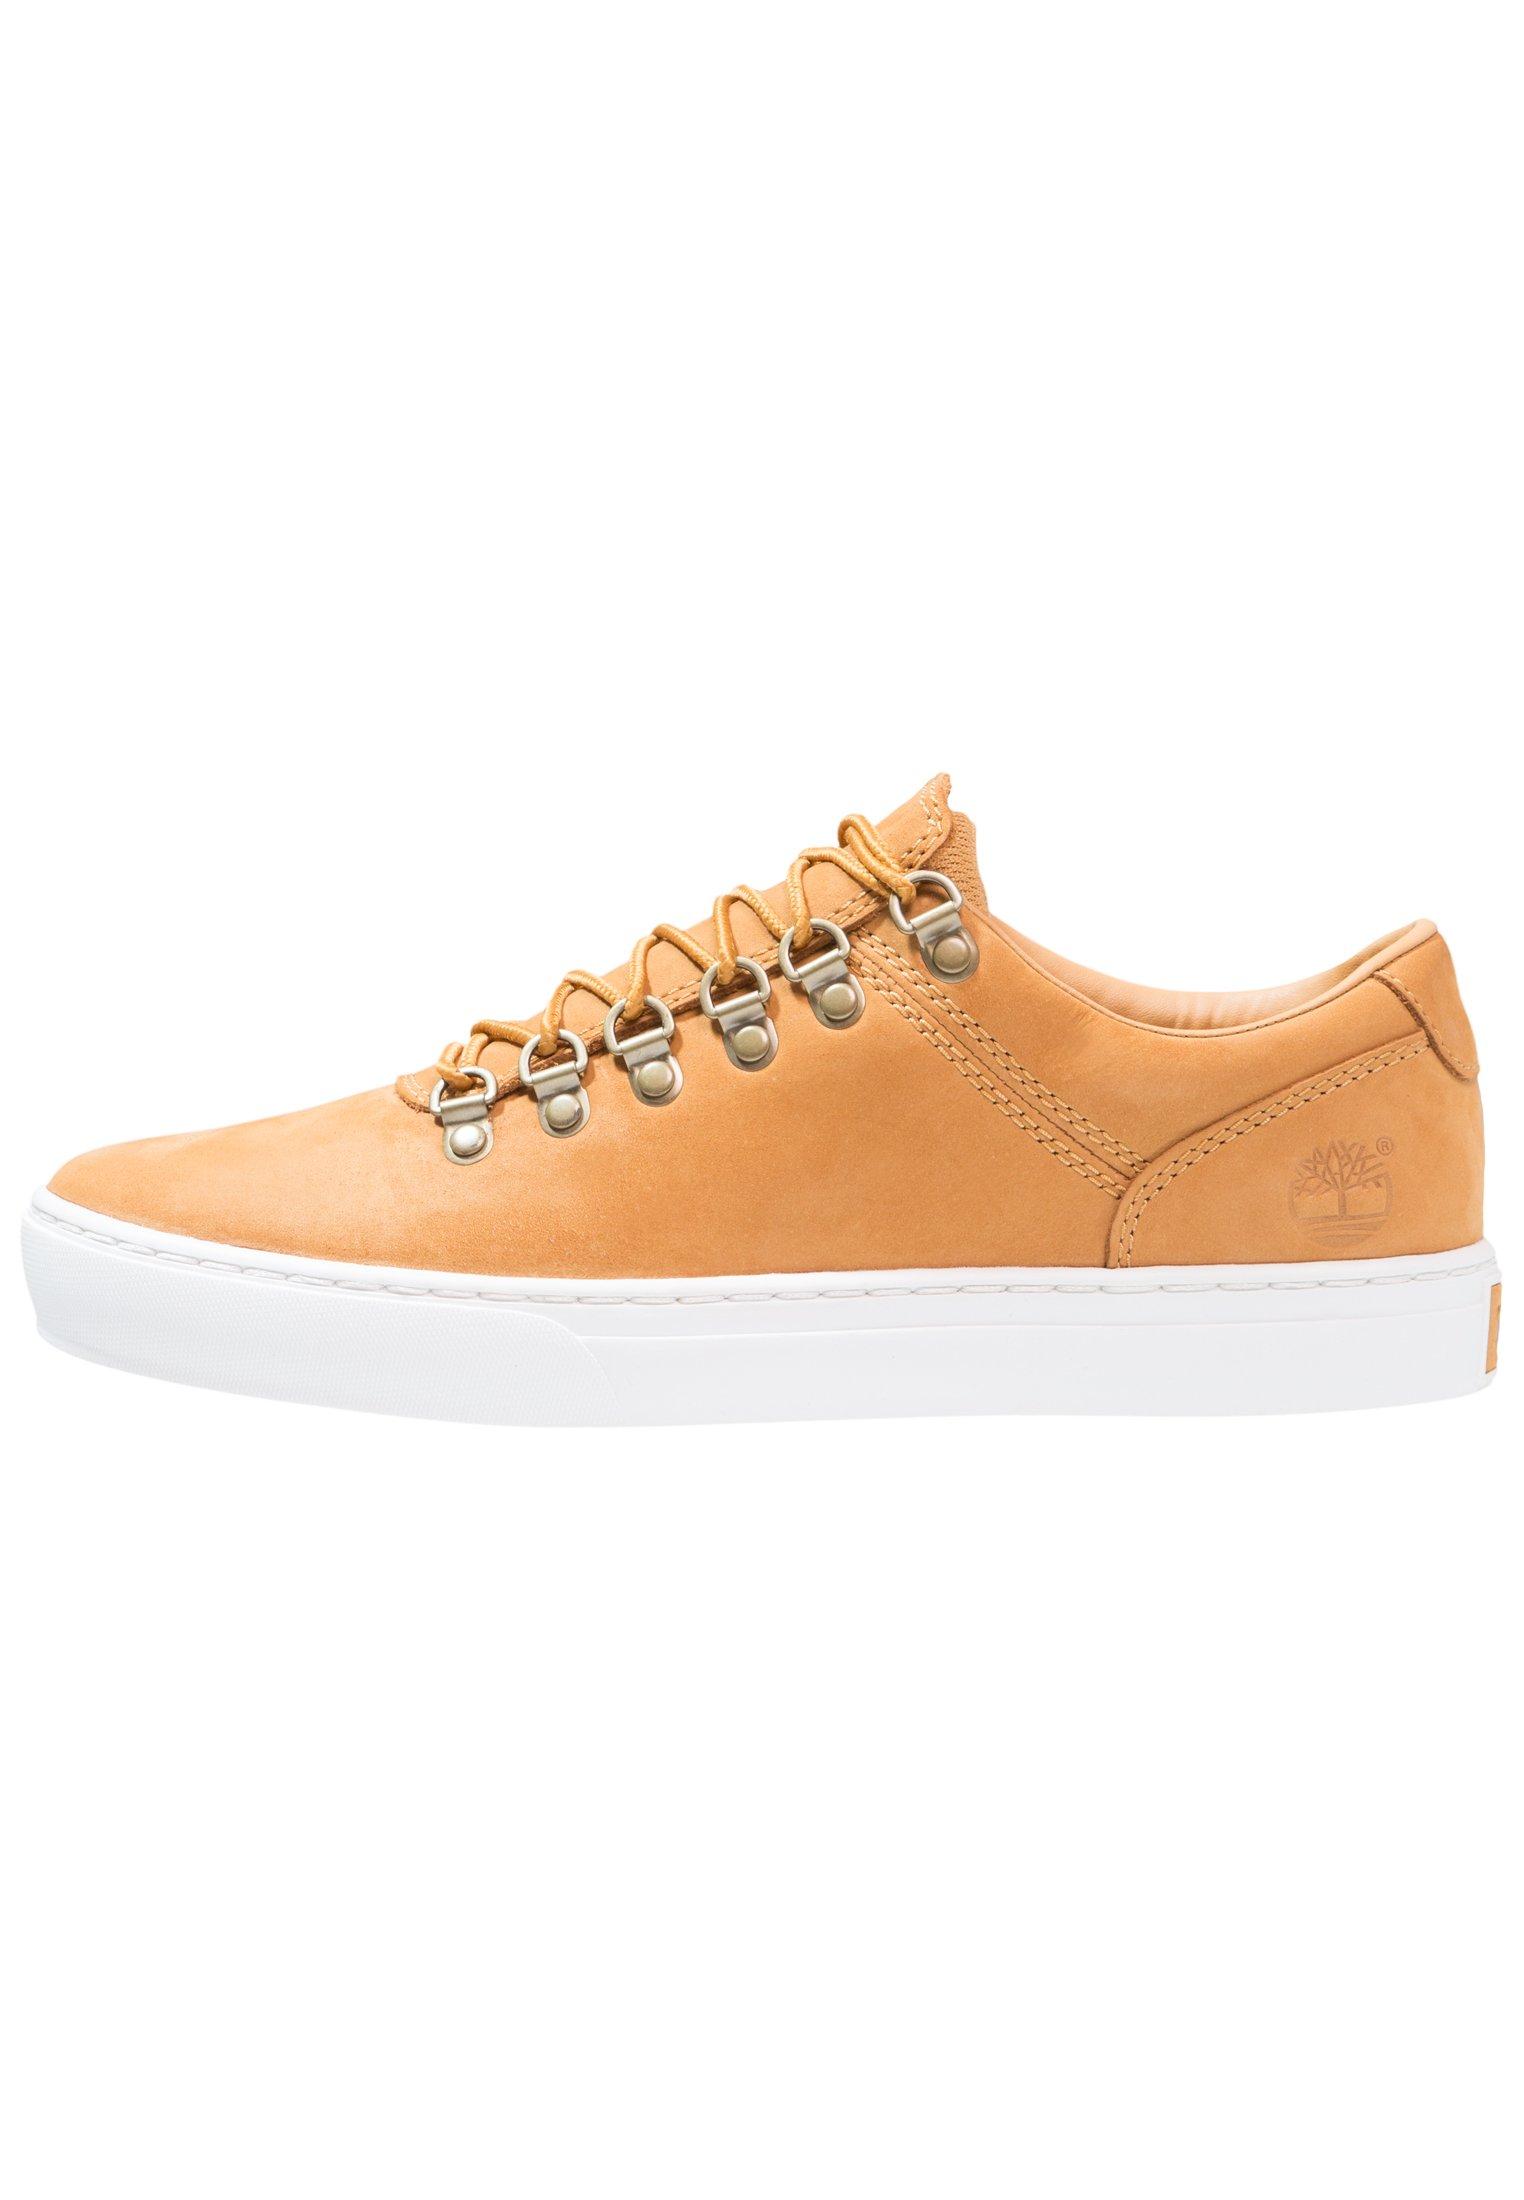 ADV 2.0 CUPSOLE ALPINE OX Sneakers basse wheat